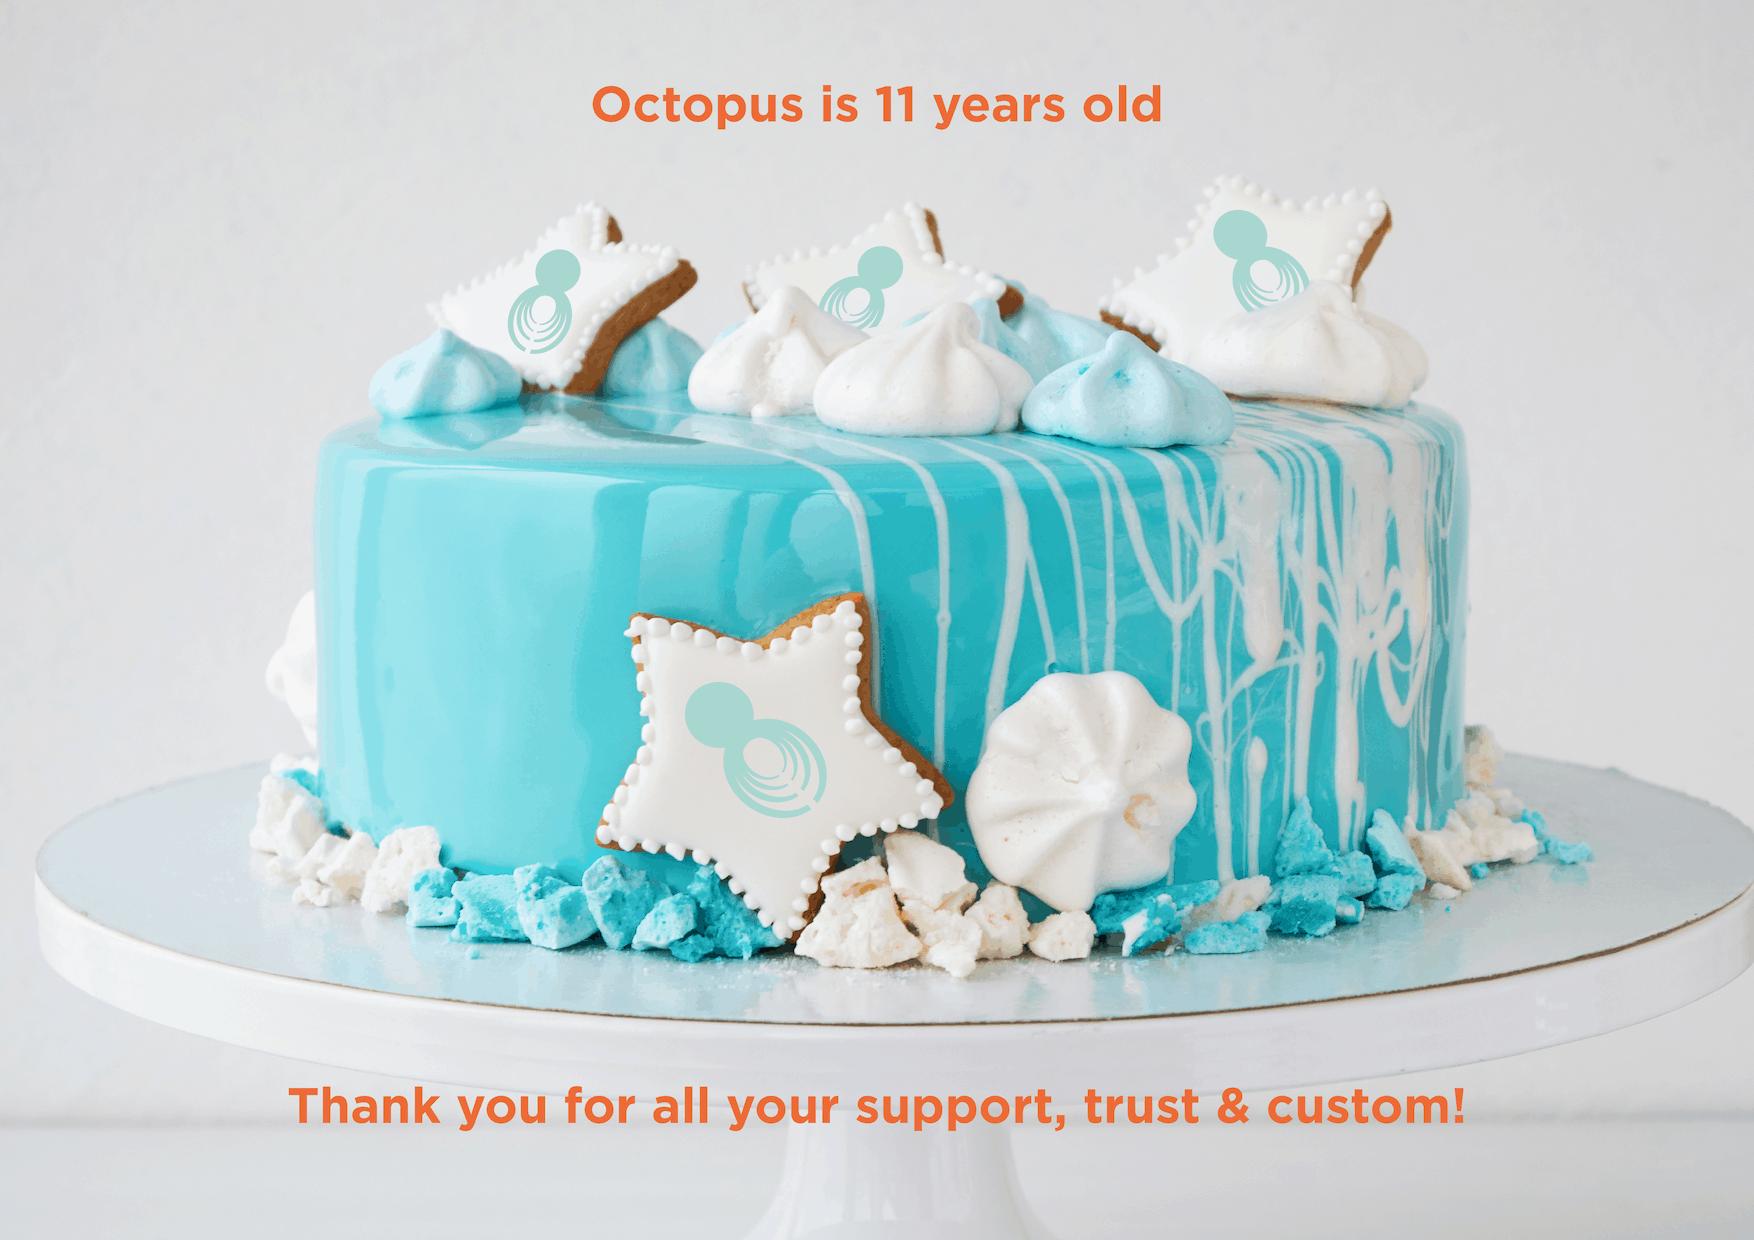 Cool Octopus Intelligence Celebrating Its 11Th Birthday Funny Birthday Cards Online Elaedamsfinfo